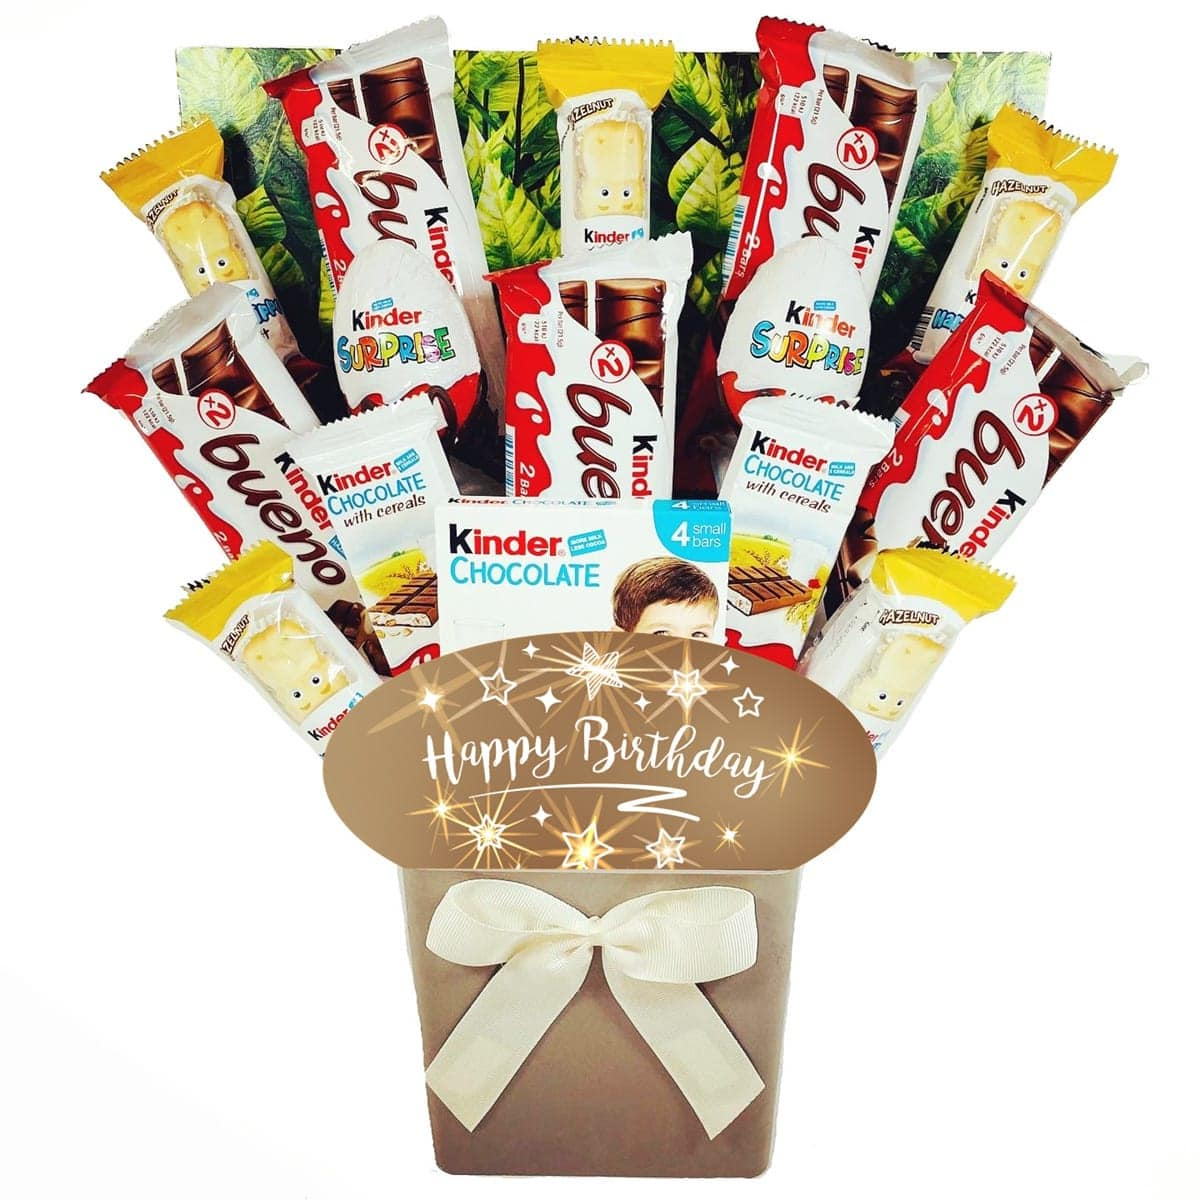 The Happy Birthday Kinder Chocolate Bouquet